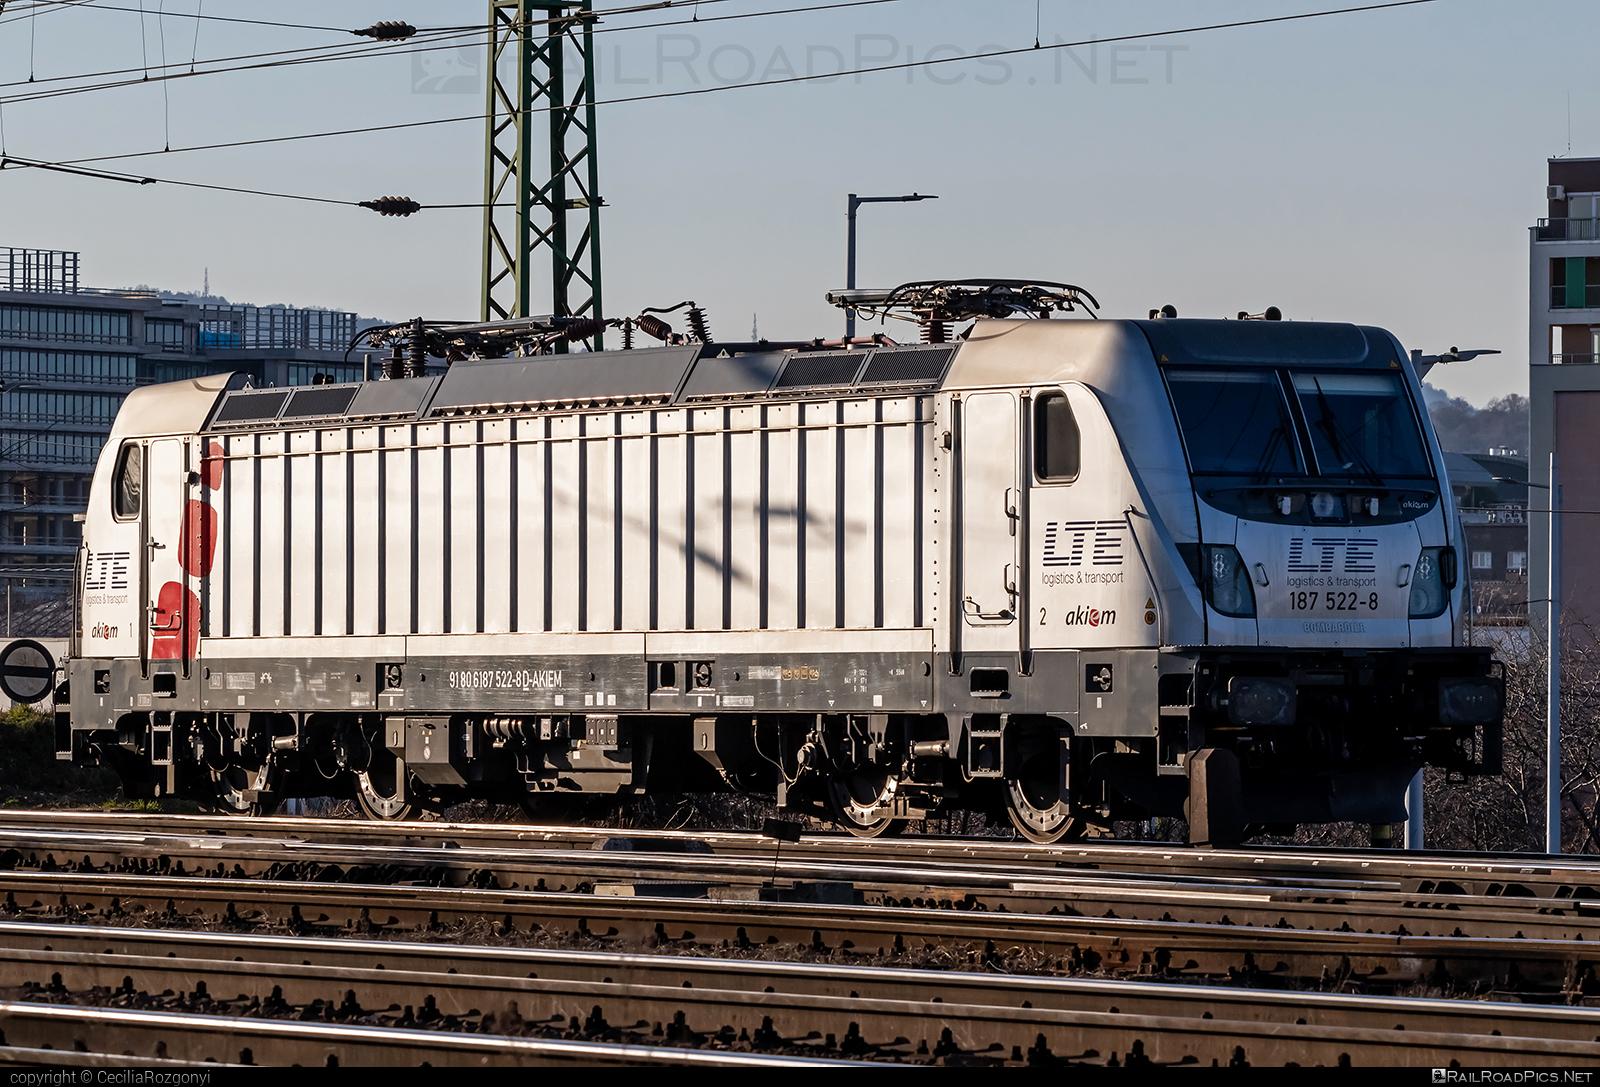 Bombardier TRAXX F140 AC3 - 187 522-8 operated by LTE Hungária Vasúti Árufuvarozó és Logisztikai Kft. #akiem #akiemsas #bombardier #bombardiertraxx #lte #traxx #traxxf140 #traxxf140ac #traxxf140ac3